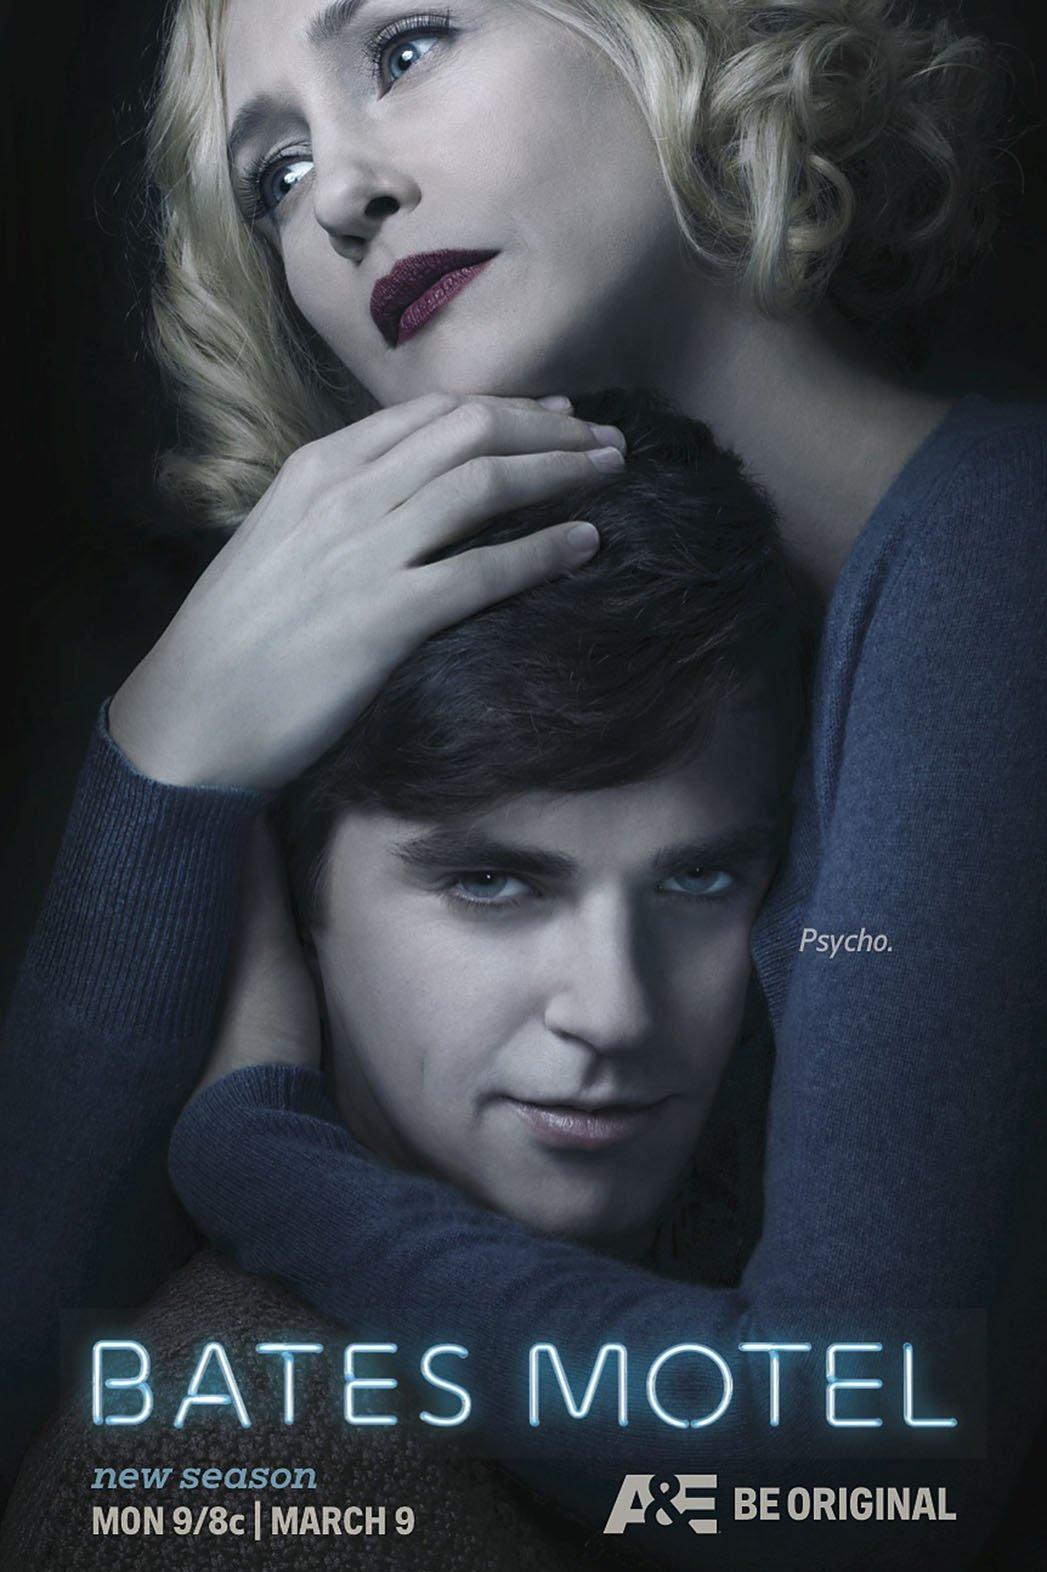 Official-film-illimite. : official-film-illimite., Bates, Motel', Season, Artwork, Released, Horror, Movies, Latest, Review